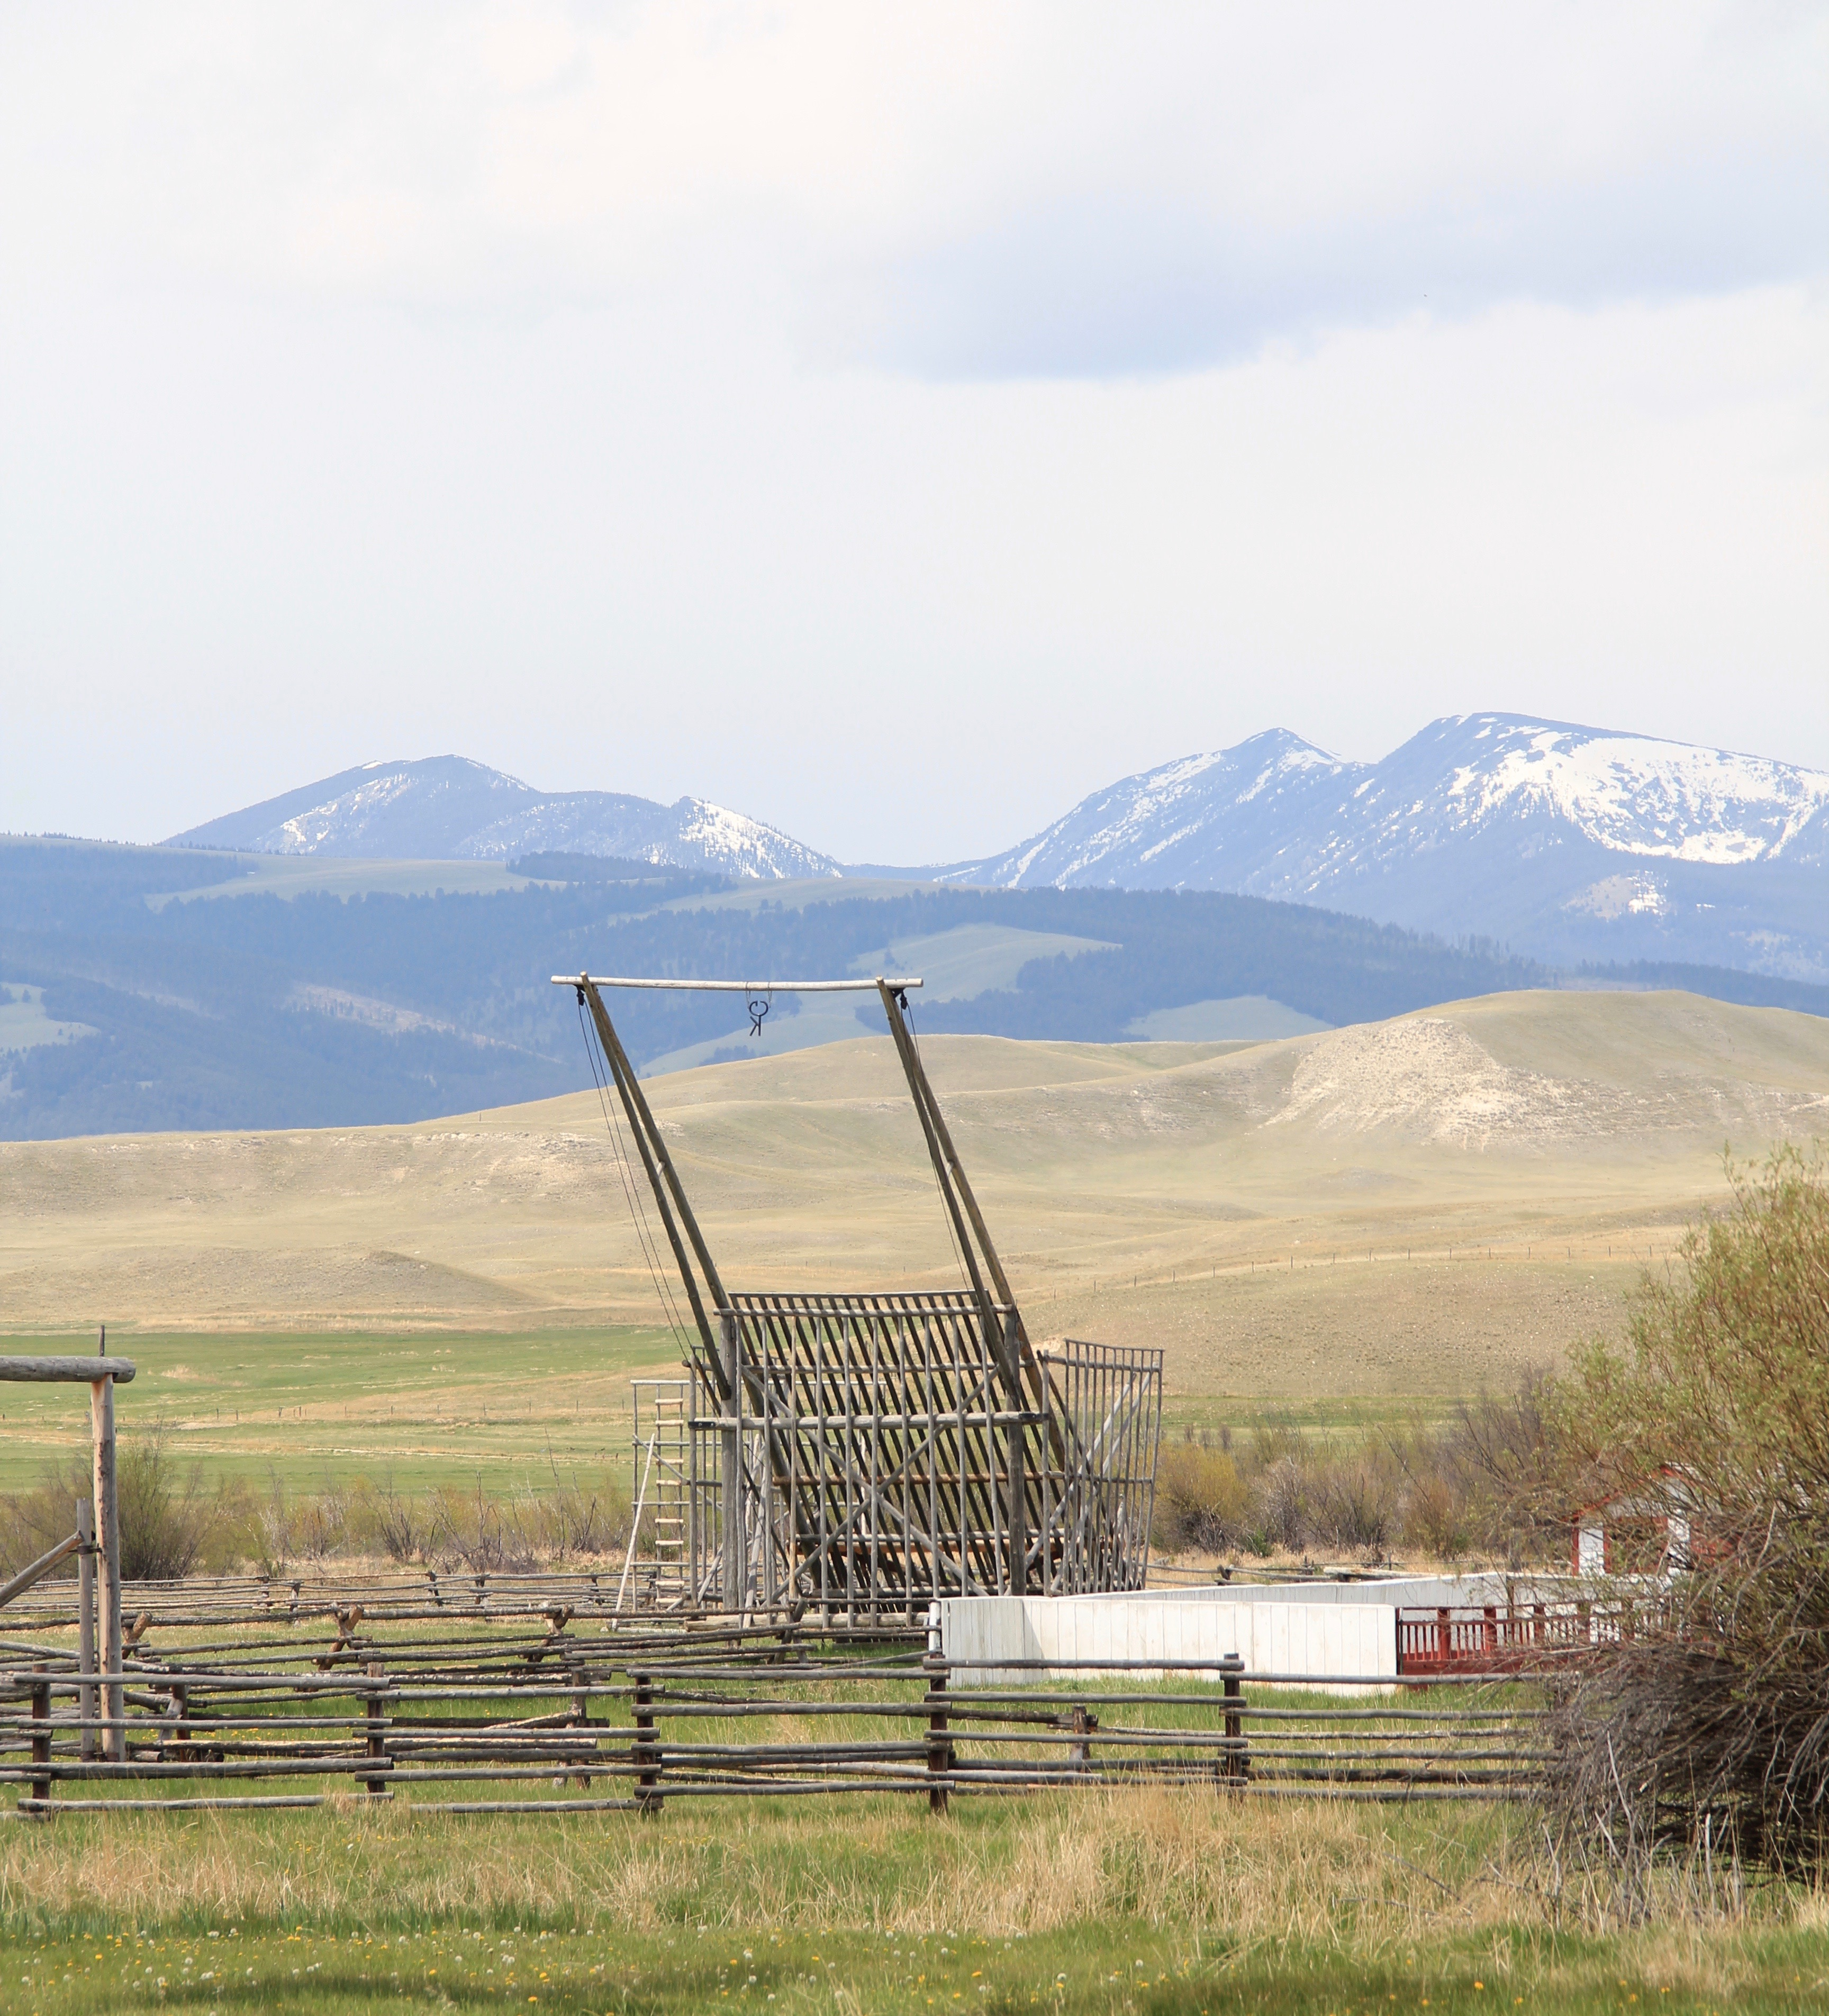 Charles Bair Revisiting Montana39s Historic Landscape